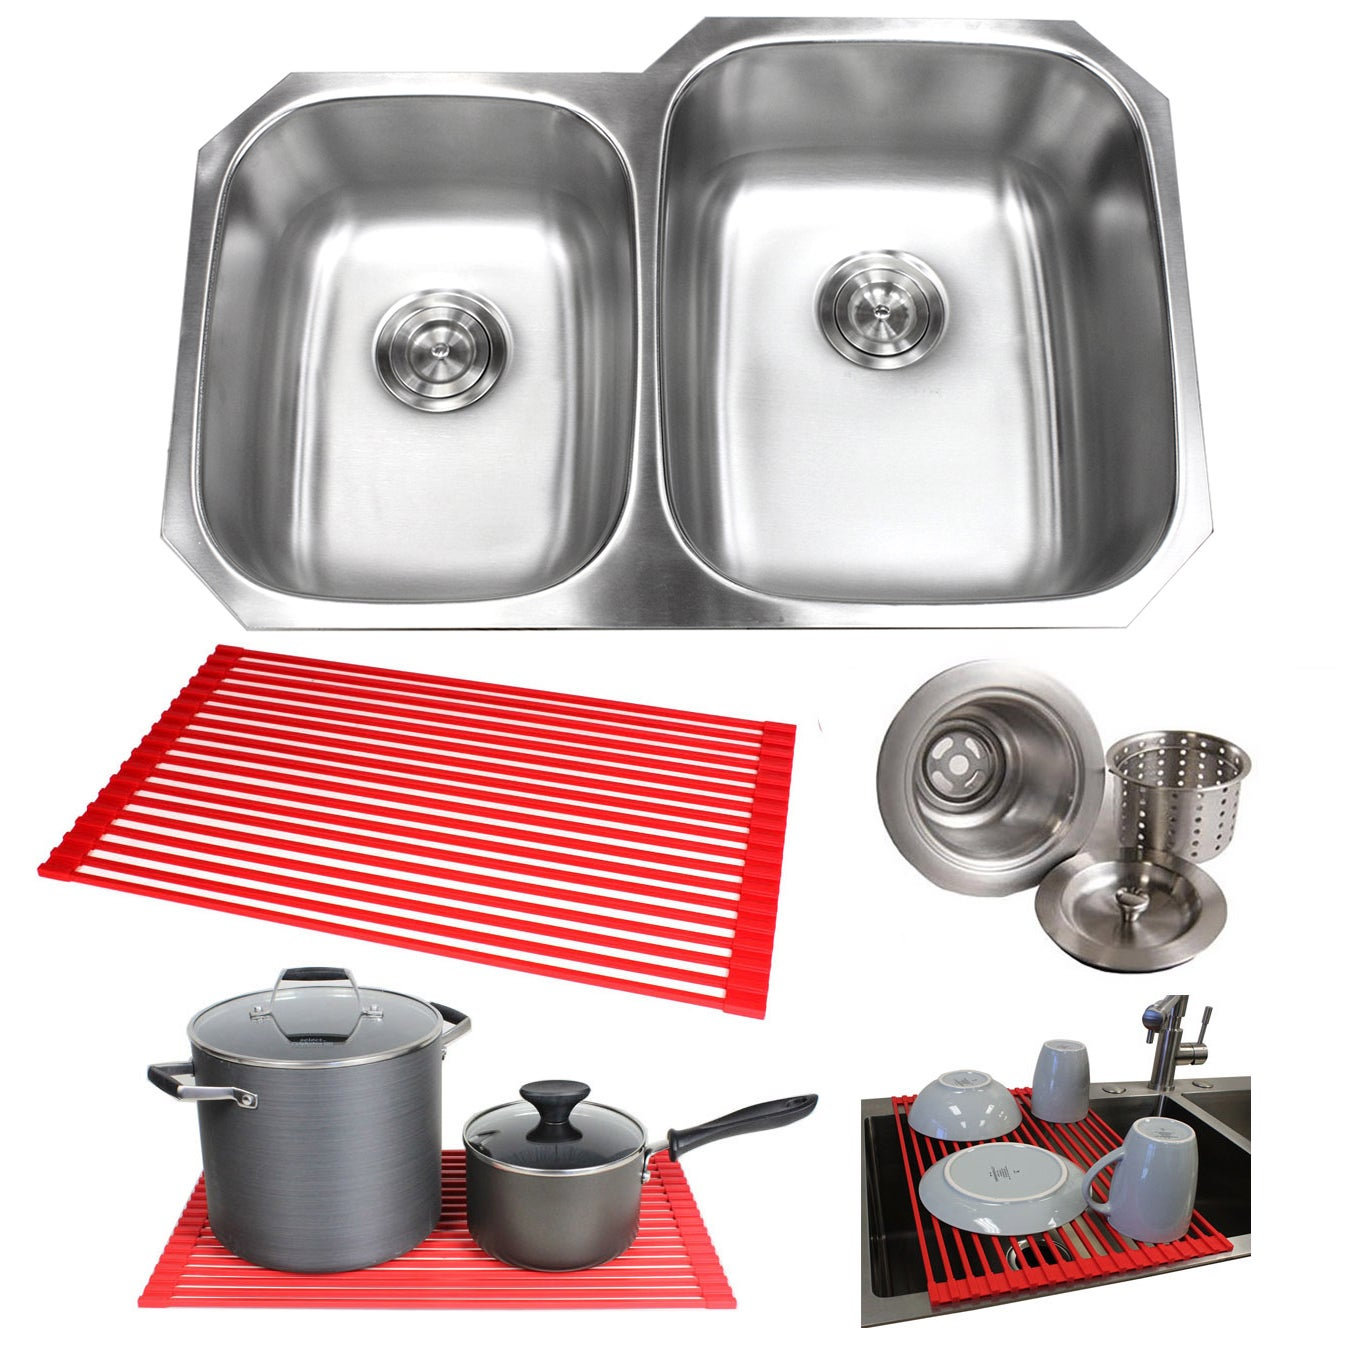 "Undermounted Steel Double Kitchen Sink (32"" Stainless Ste..."